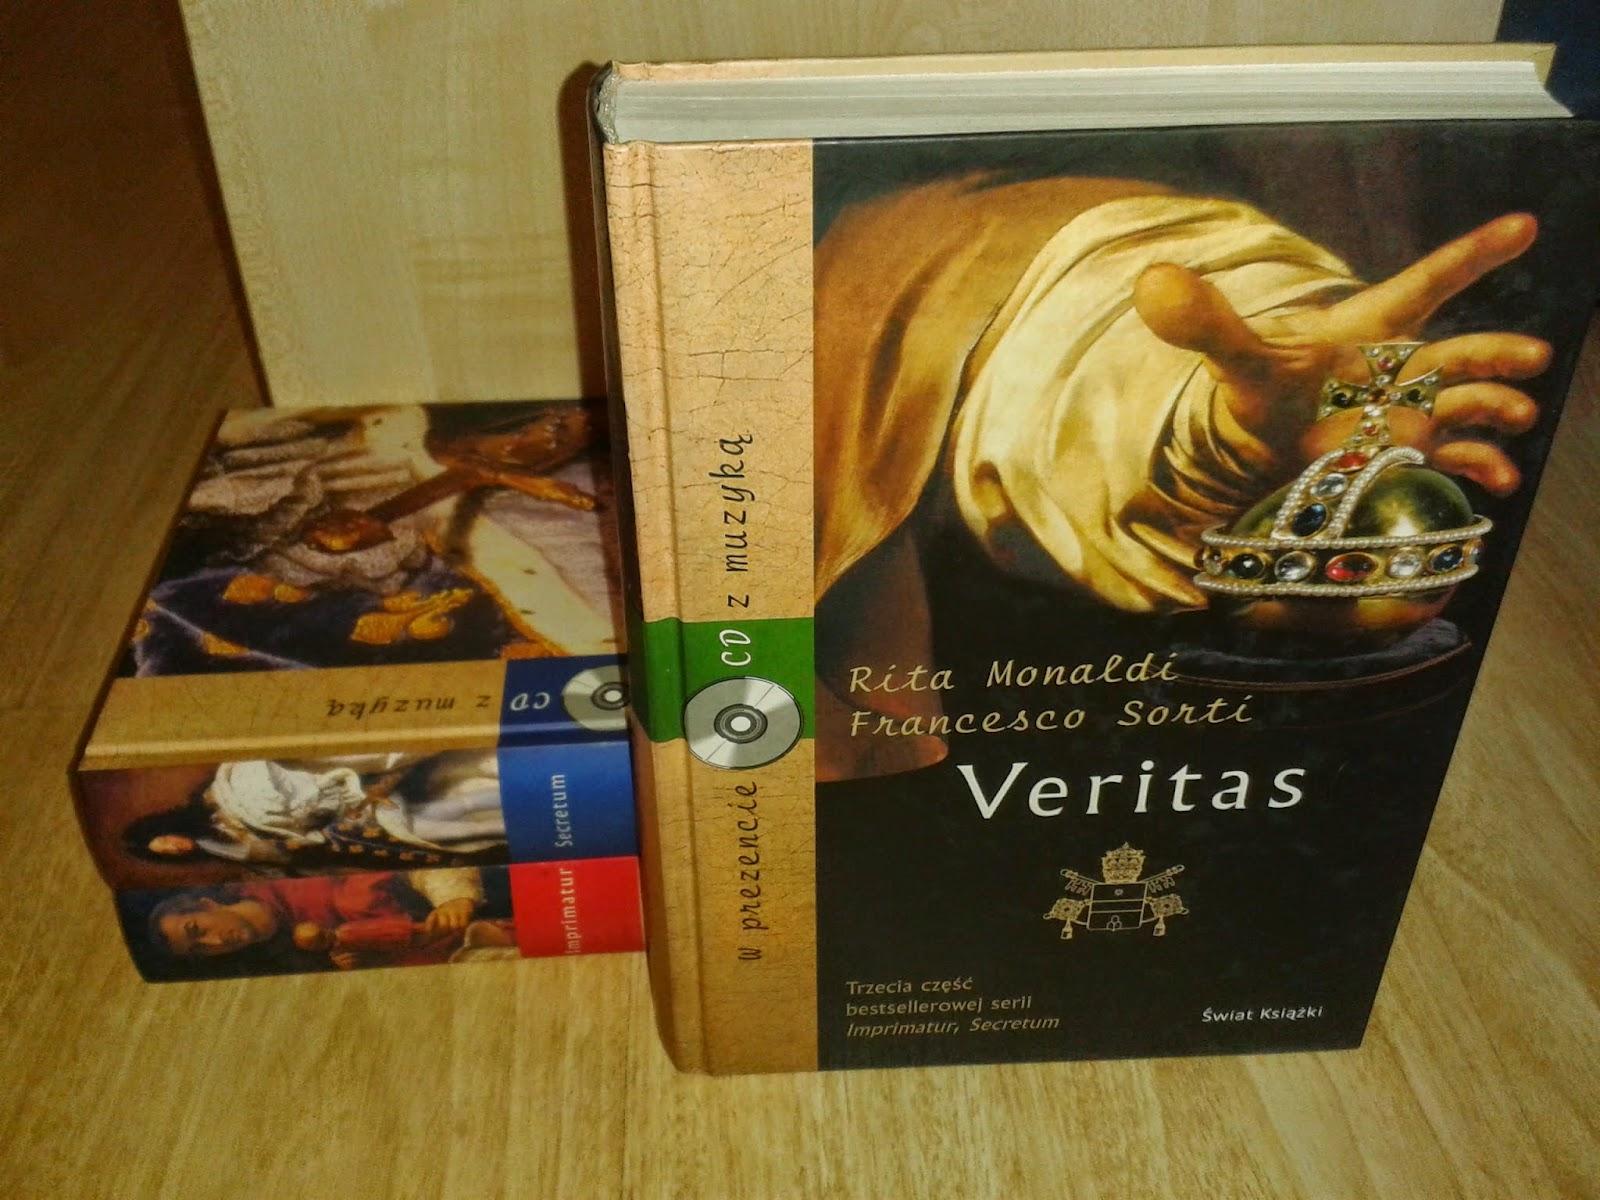 http://artemis-shelf.blogspot.com/2014/11/r-monadli-sorti-veritas.html